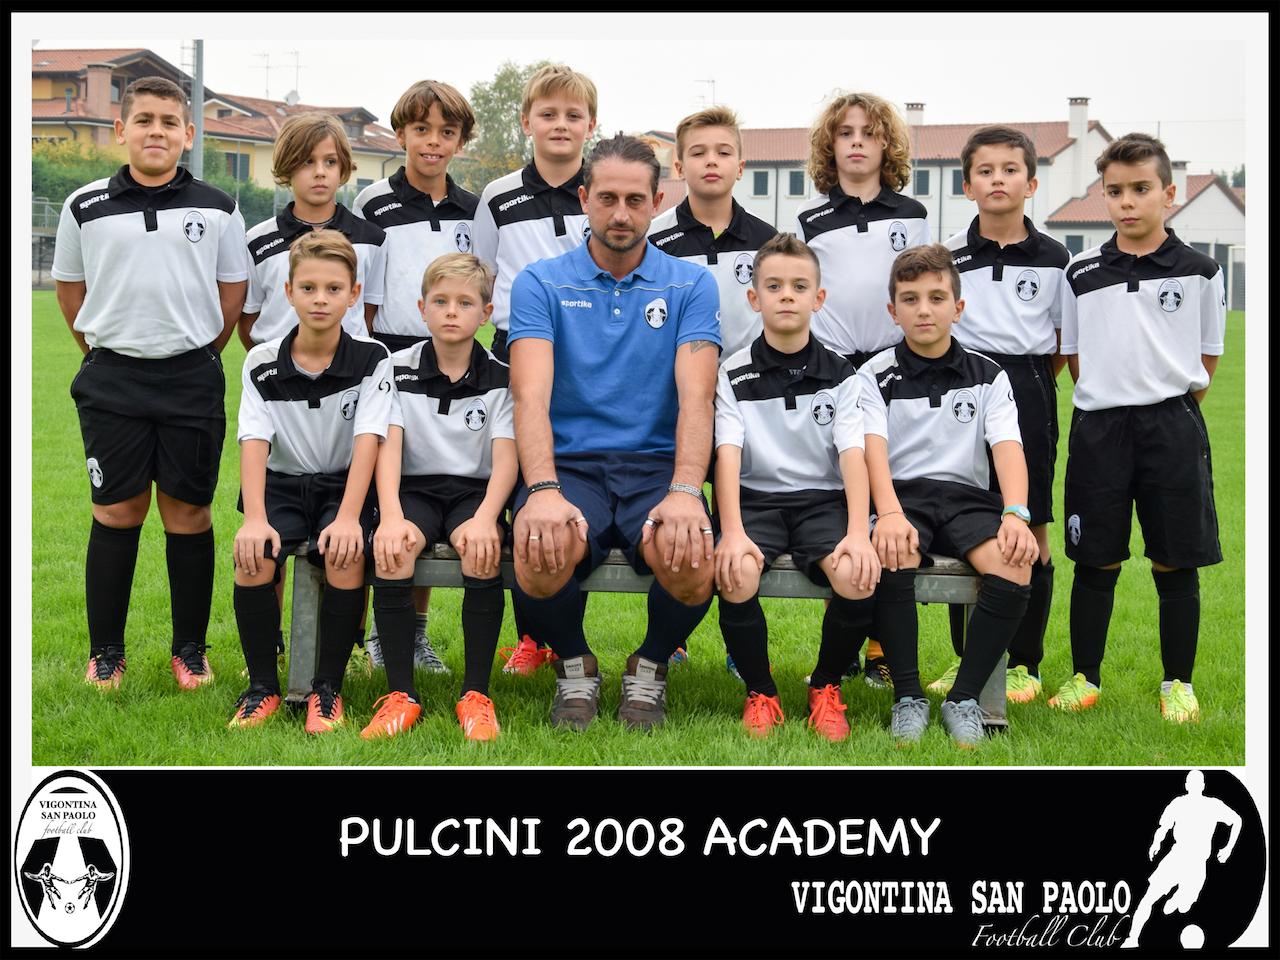 2008 Pulcini - Cagnin